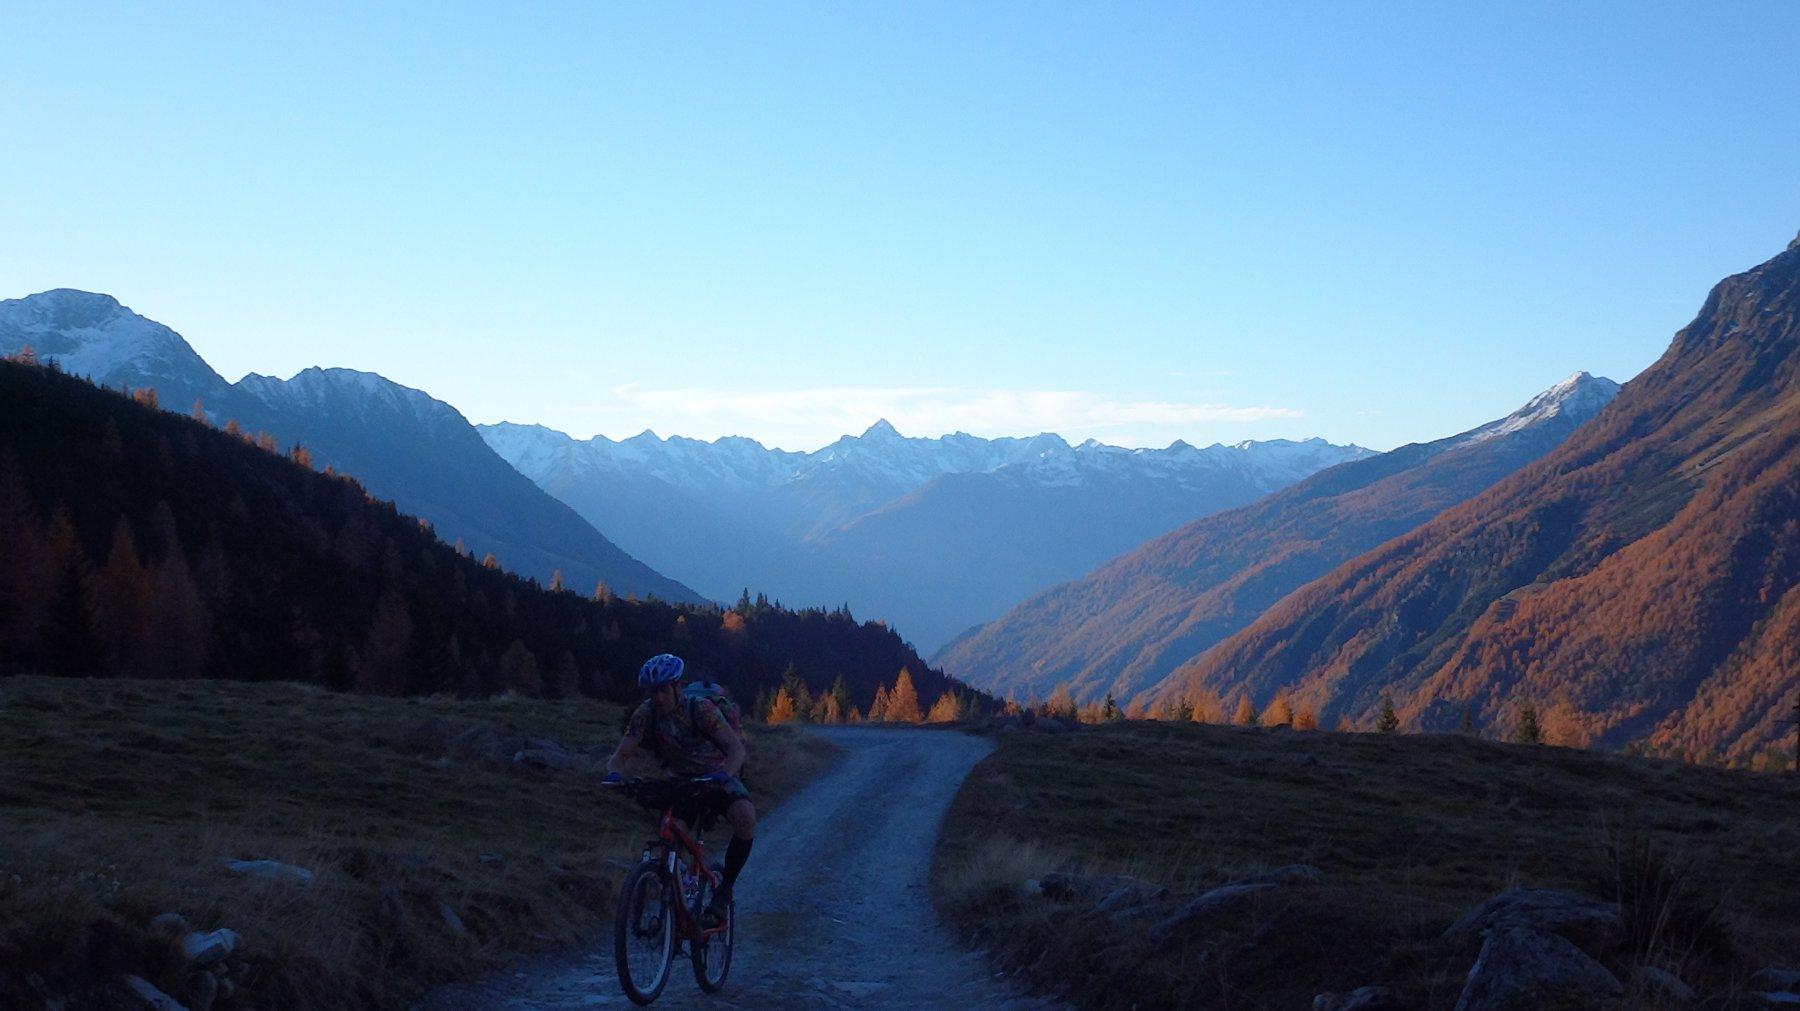 verso le Alpi Orobie